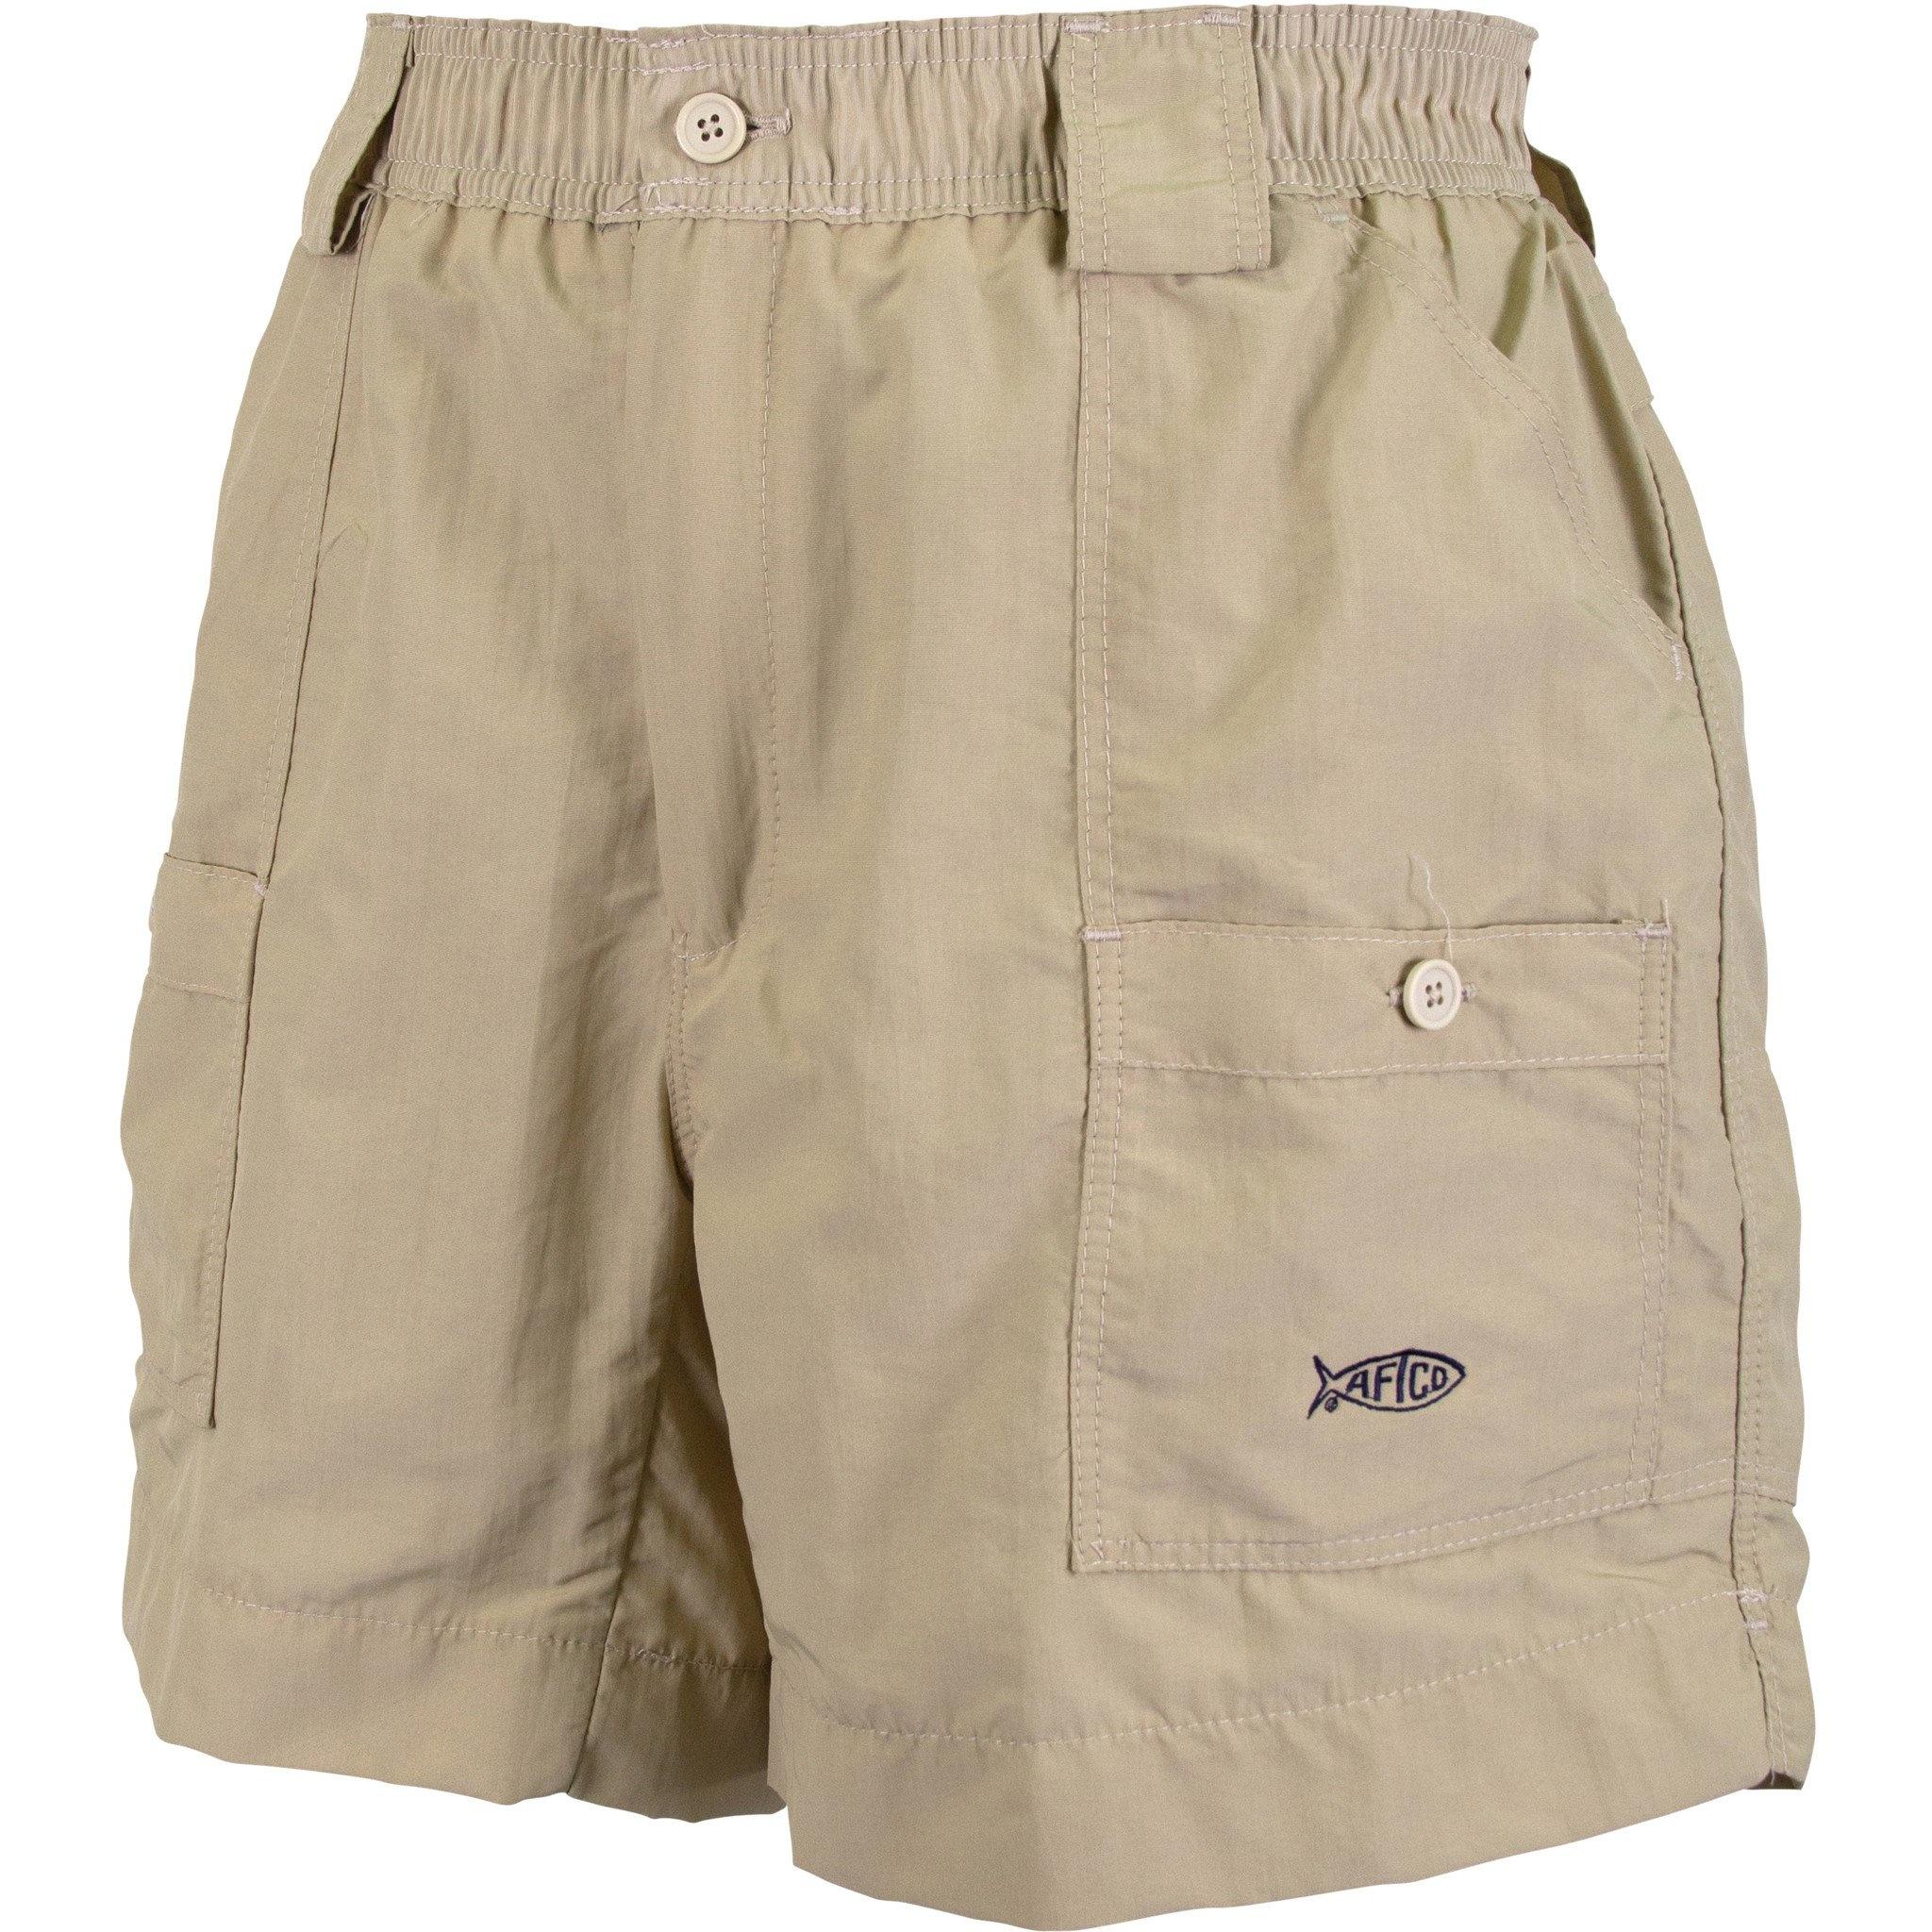 Aftco Original Fishing Shorts Khaki